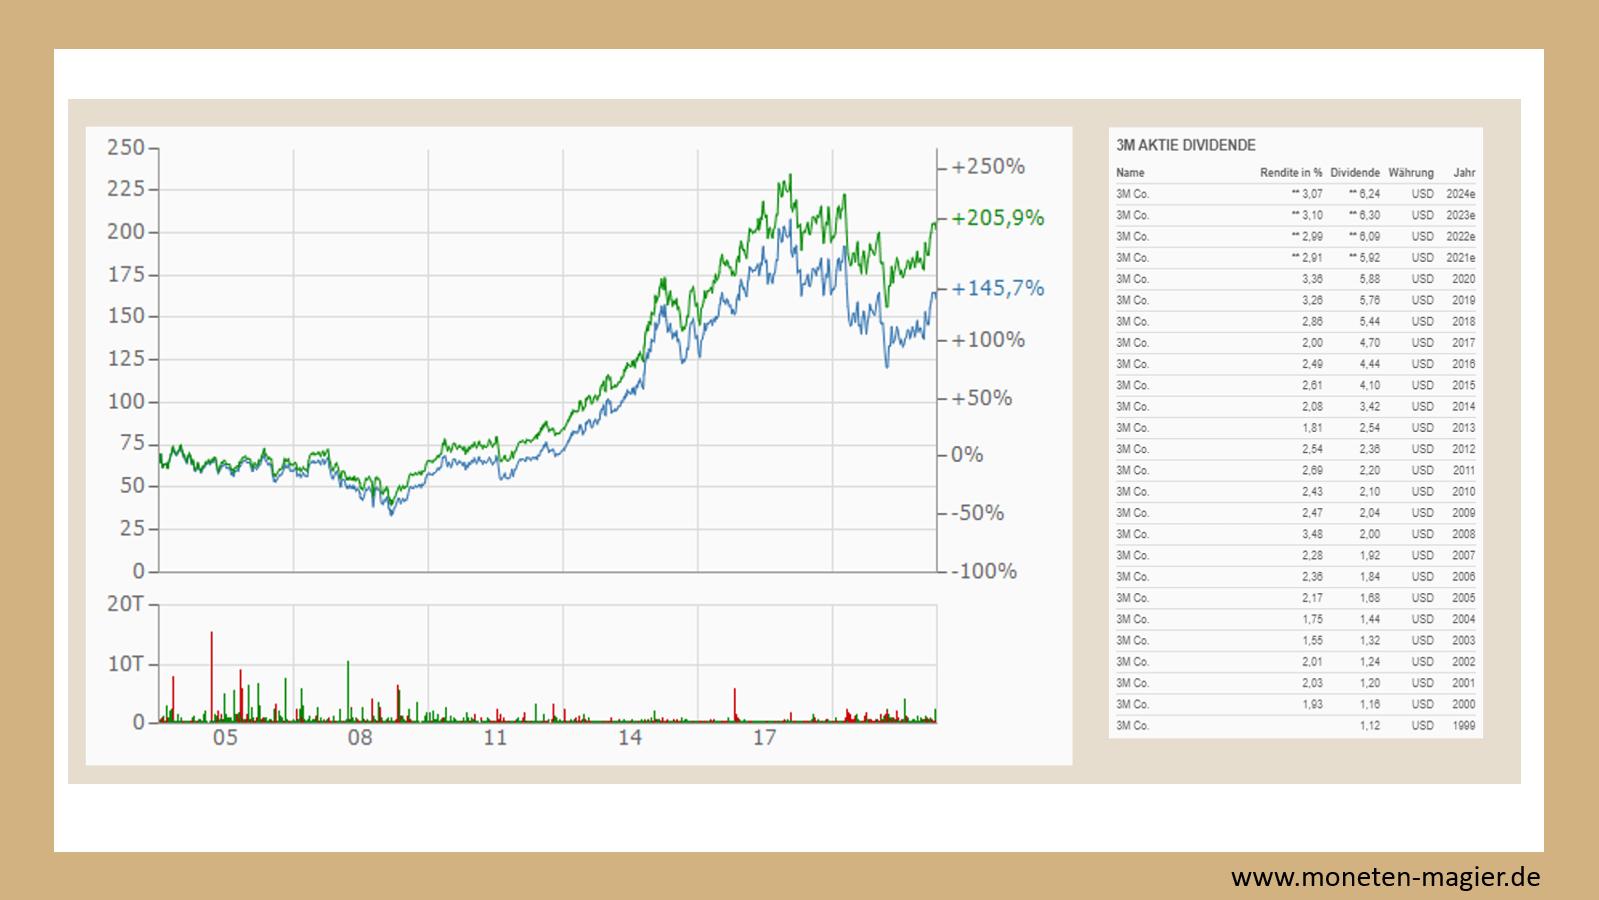 top 10 dividenden aktien moneten magier 3m